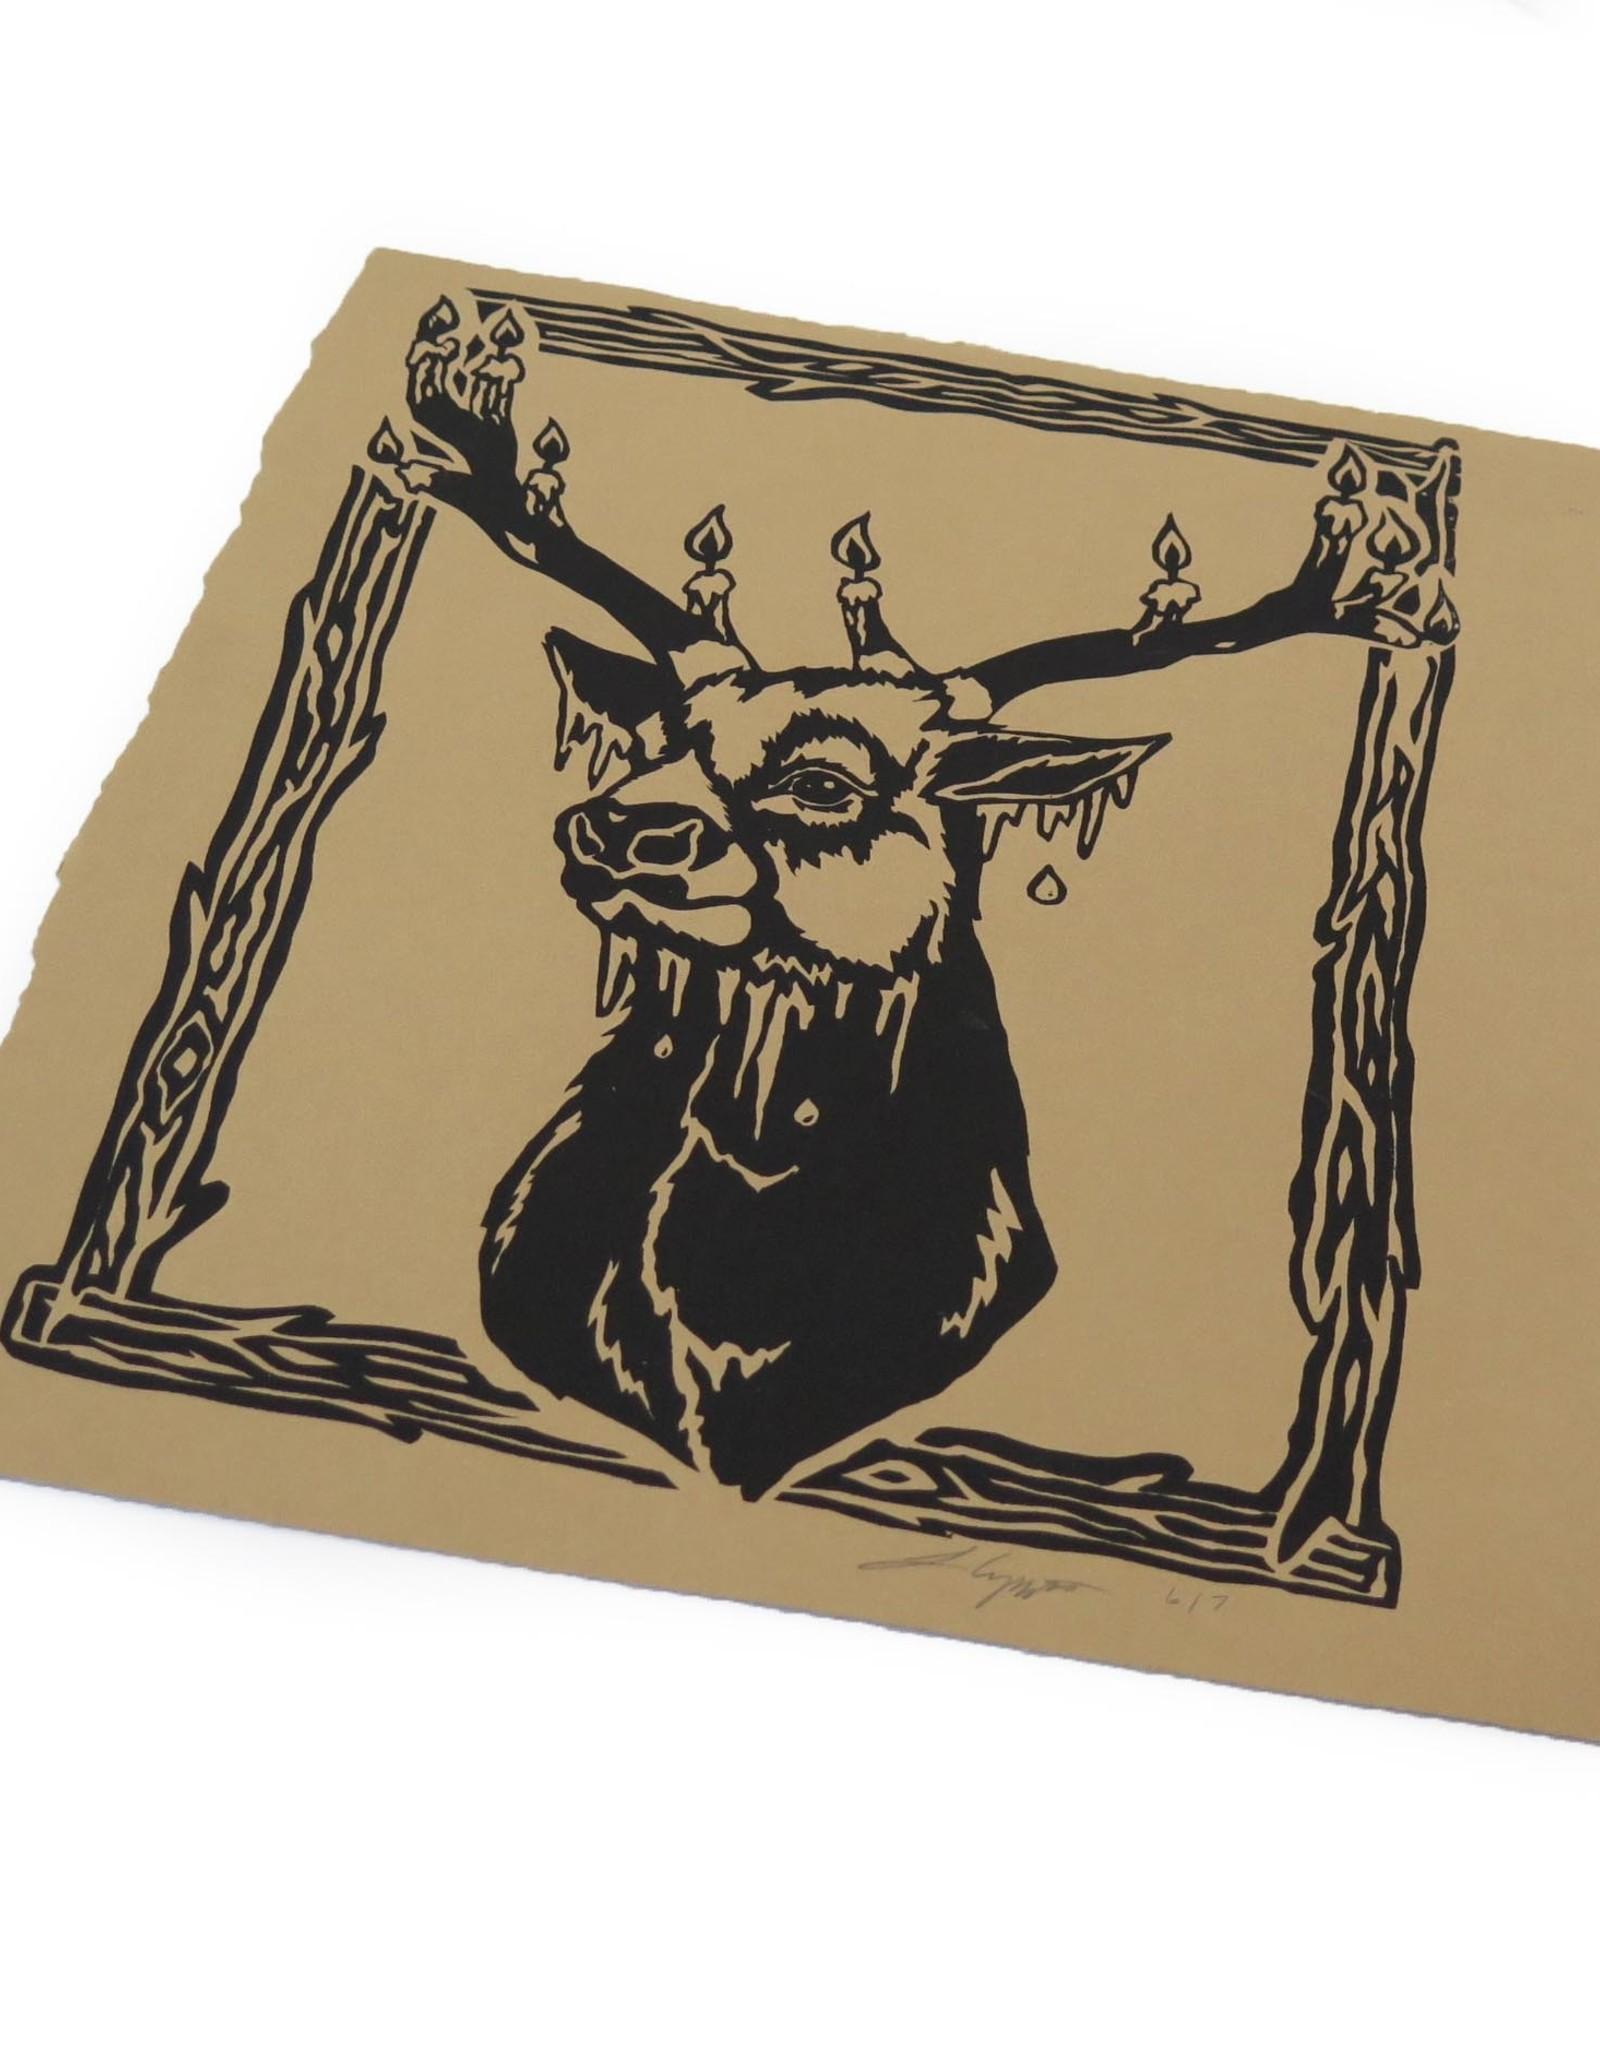 Untitled (Deer) screenprint, Lily Cozzens